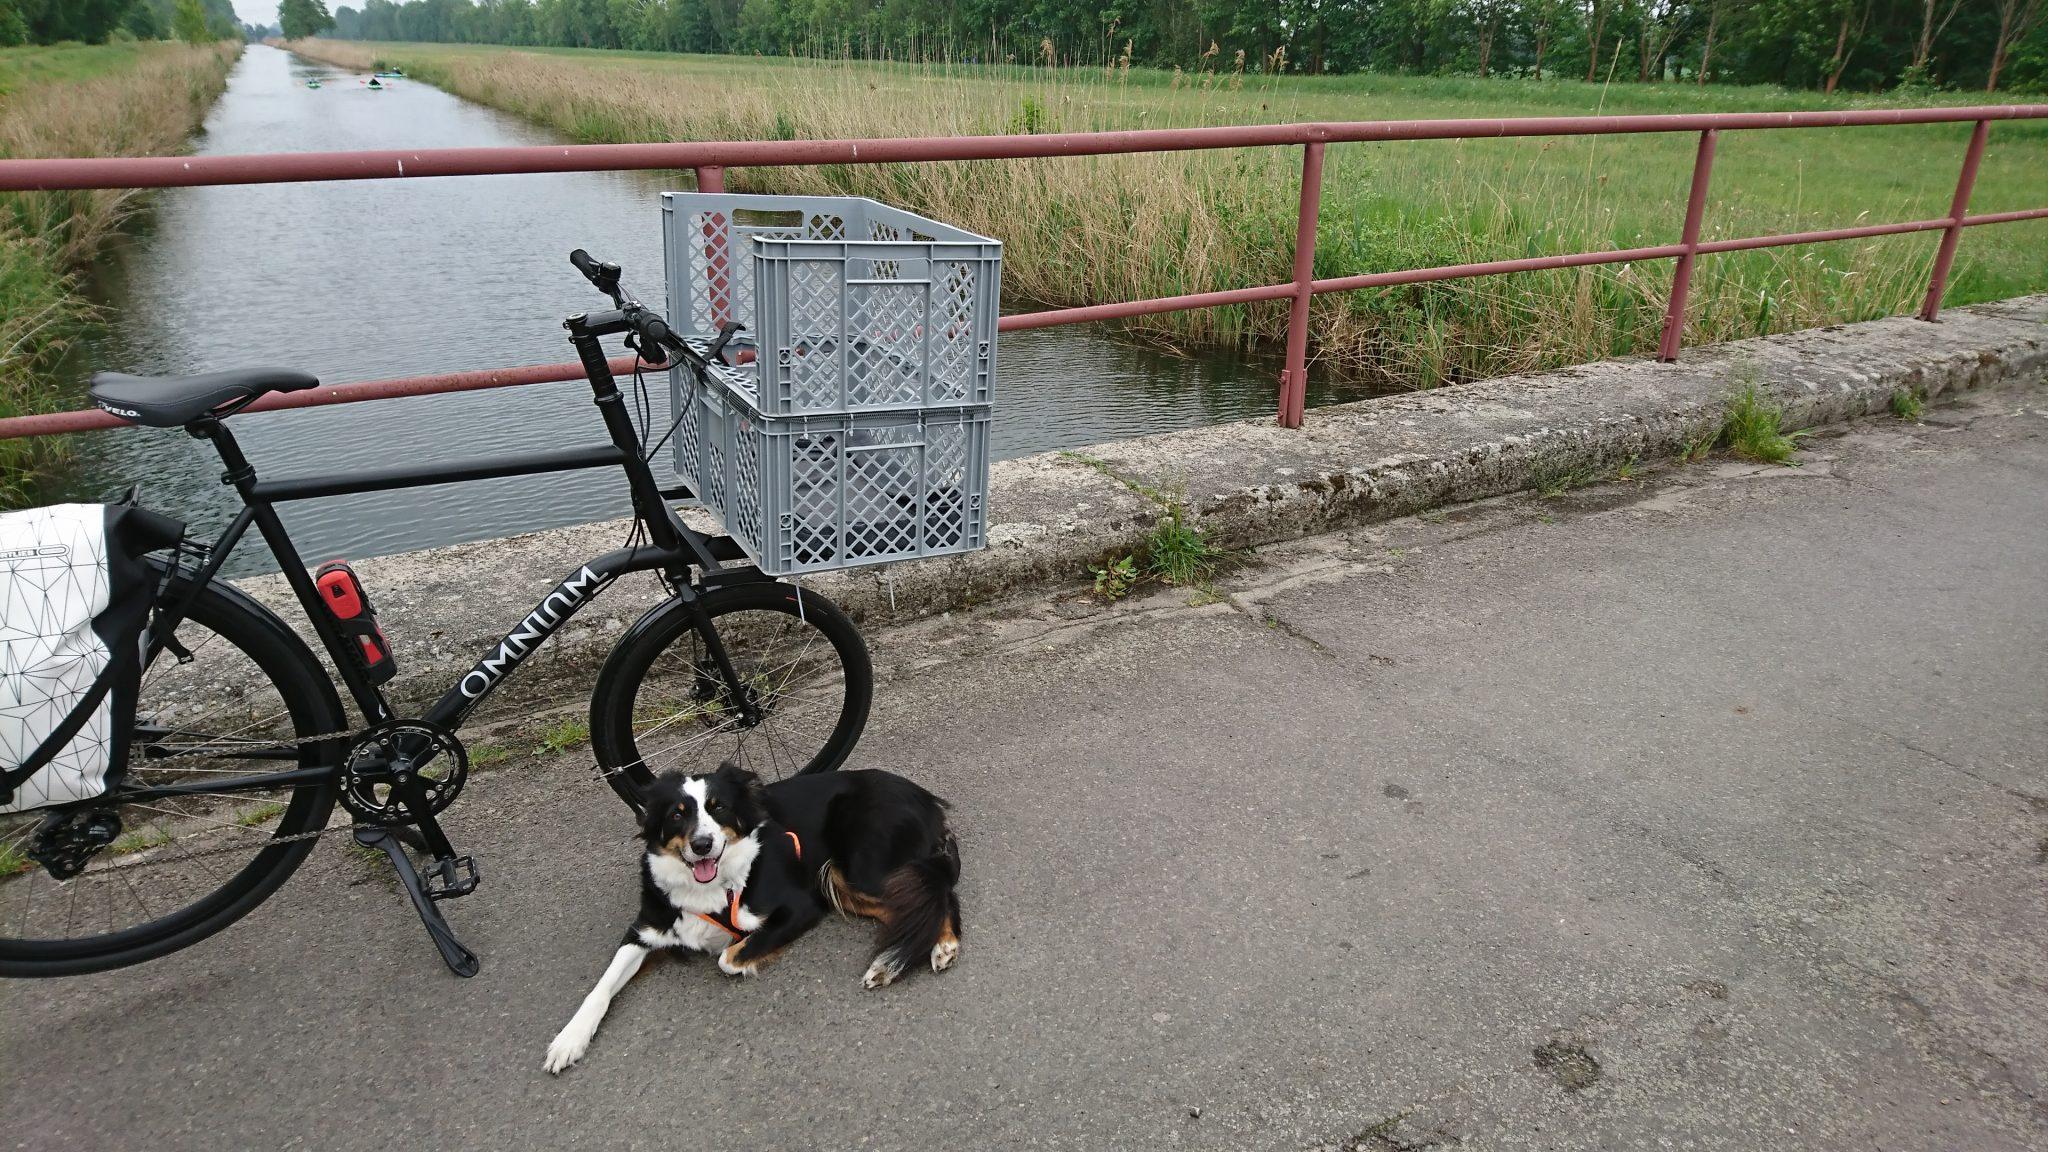 Hund liegt neben dem Fahrrad auf der Brücke am Fluss